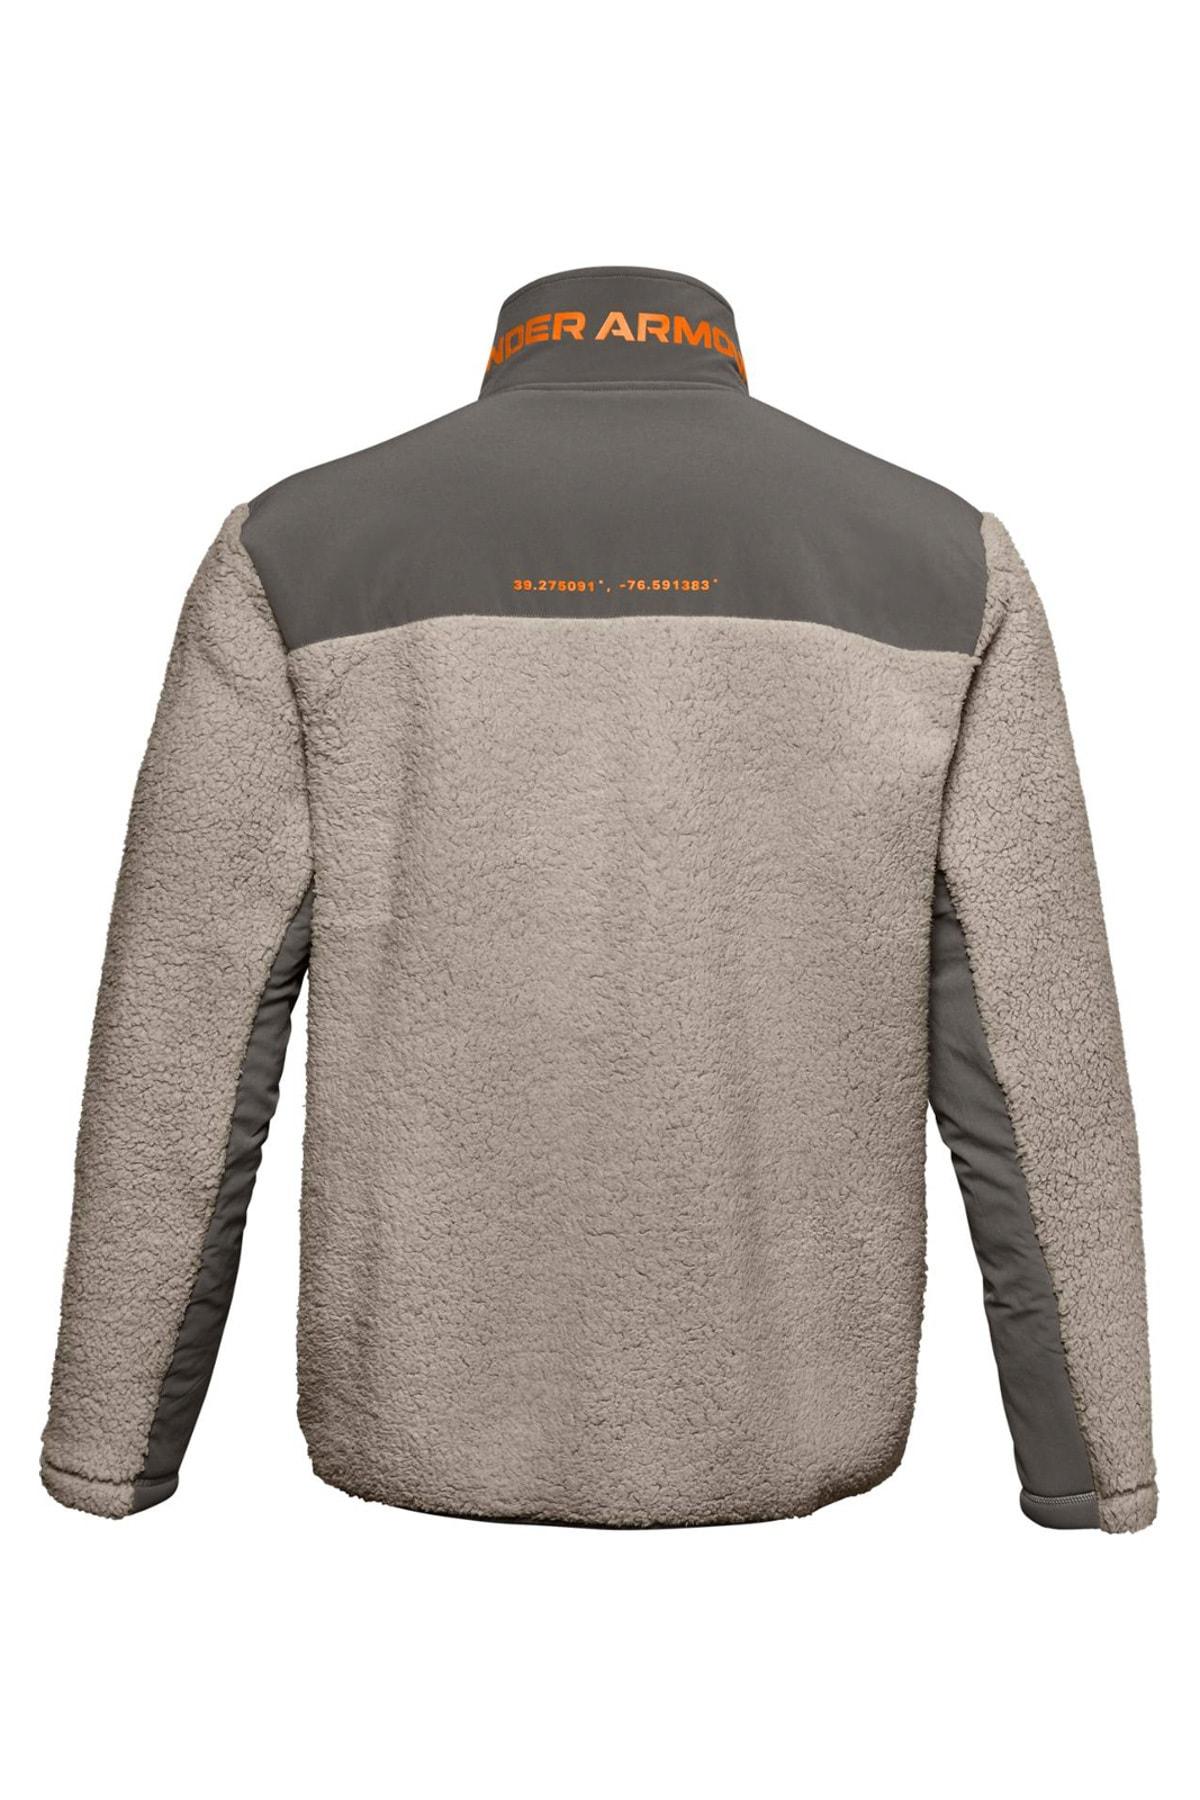 Under Armour Erkek Spor Sweatshirt - Ua Legacy Sherpa Swacket - 1357474-200 2